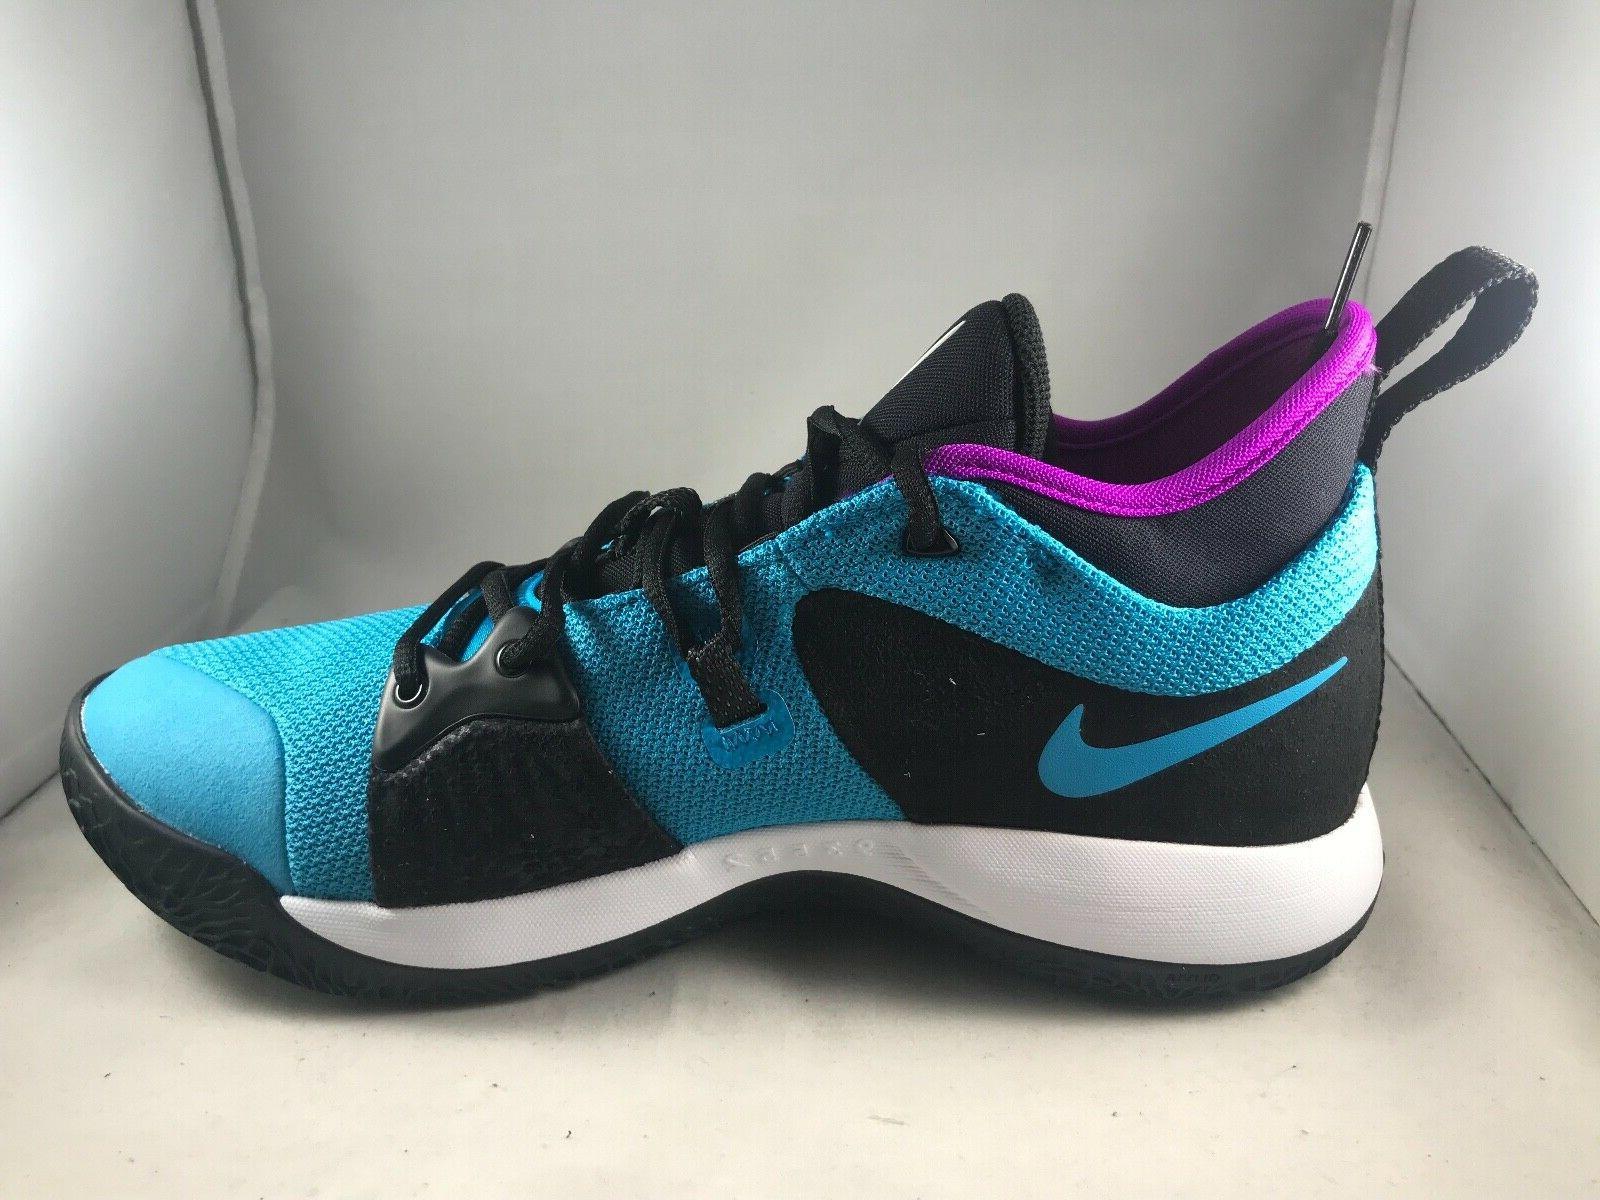 Nike PG Lagoon Paul George Shoes AJ2039- Size